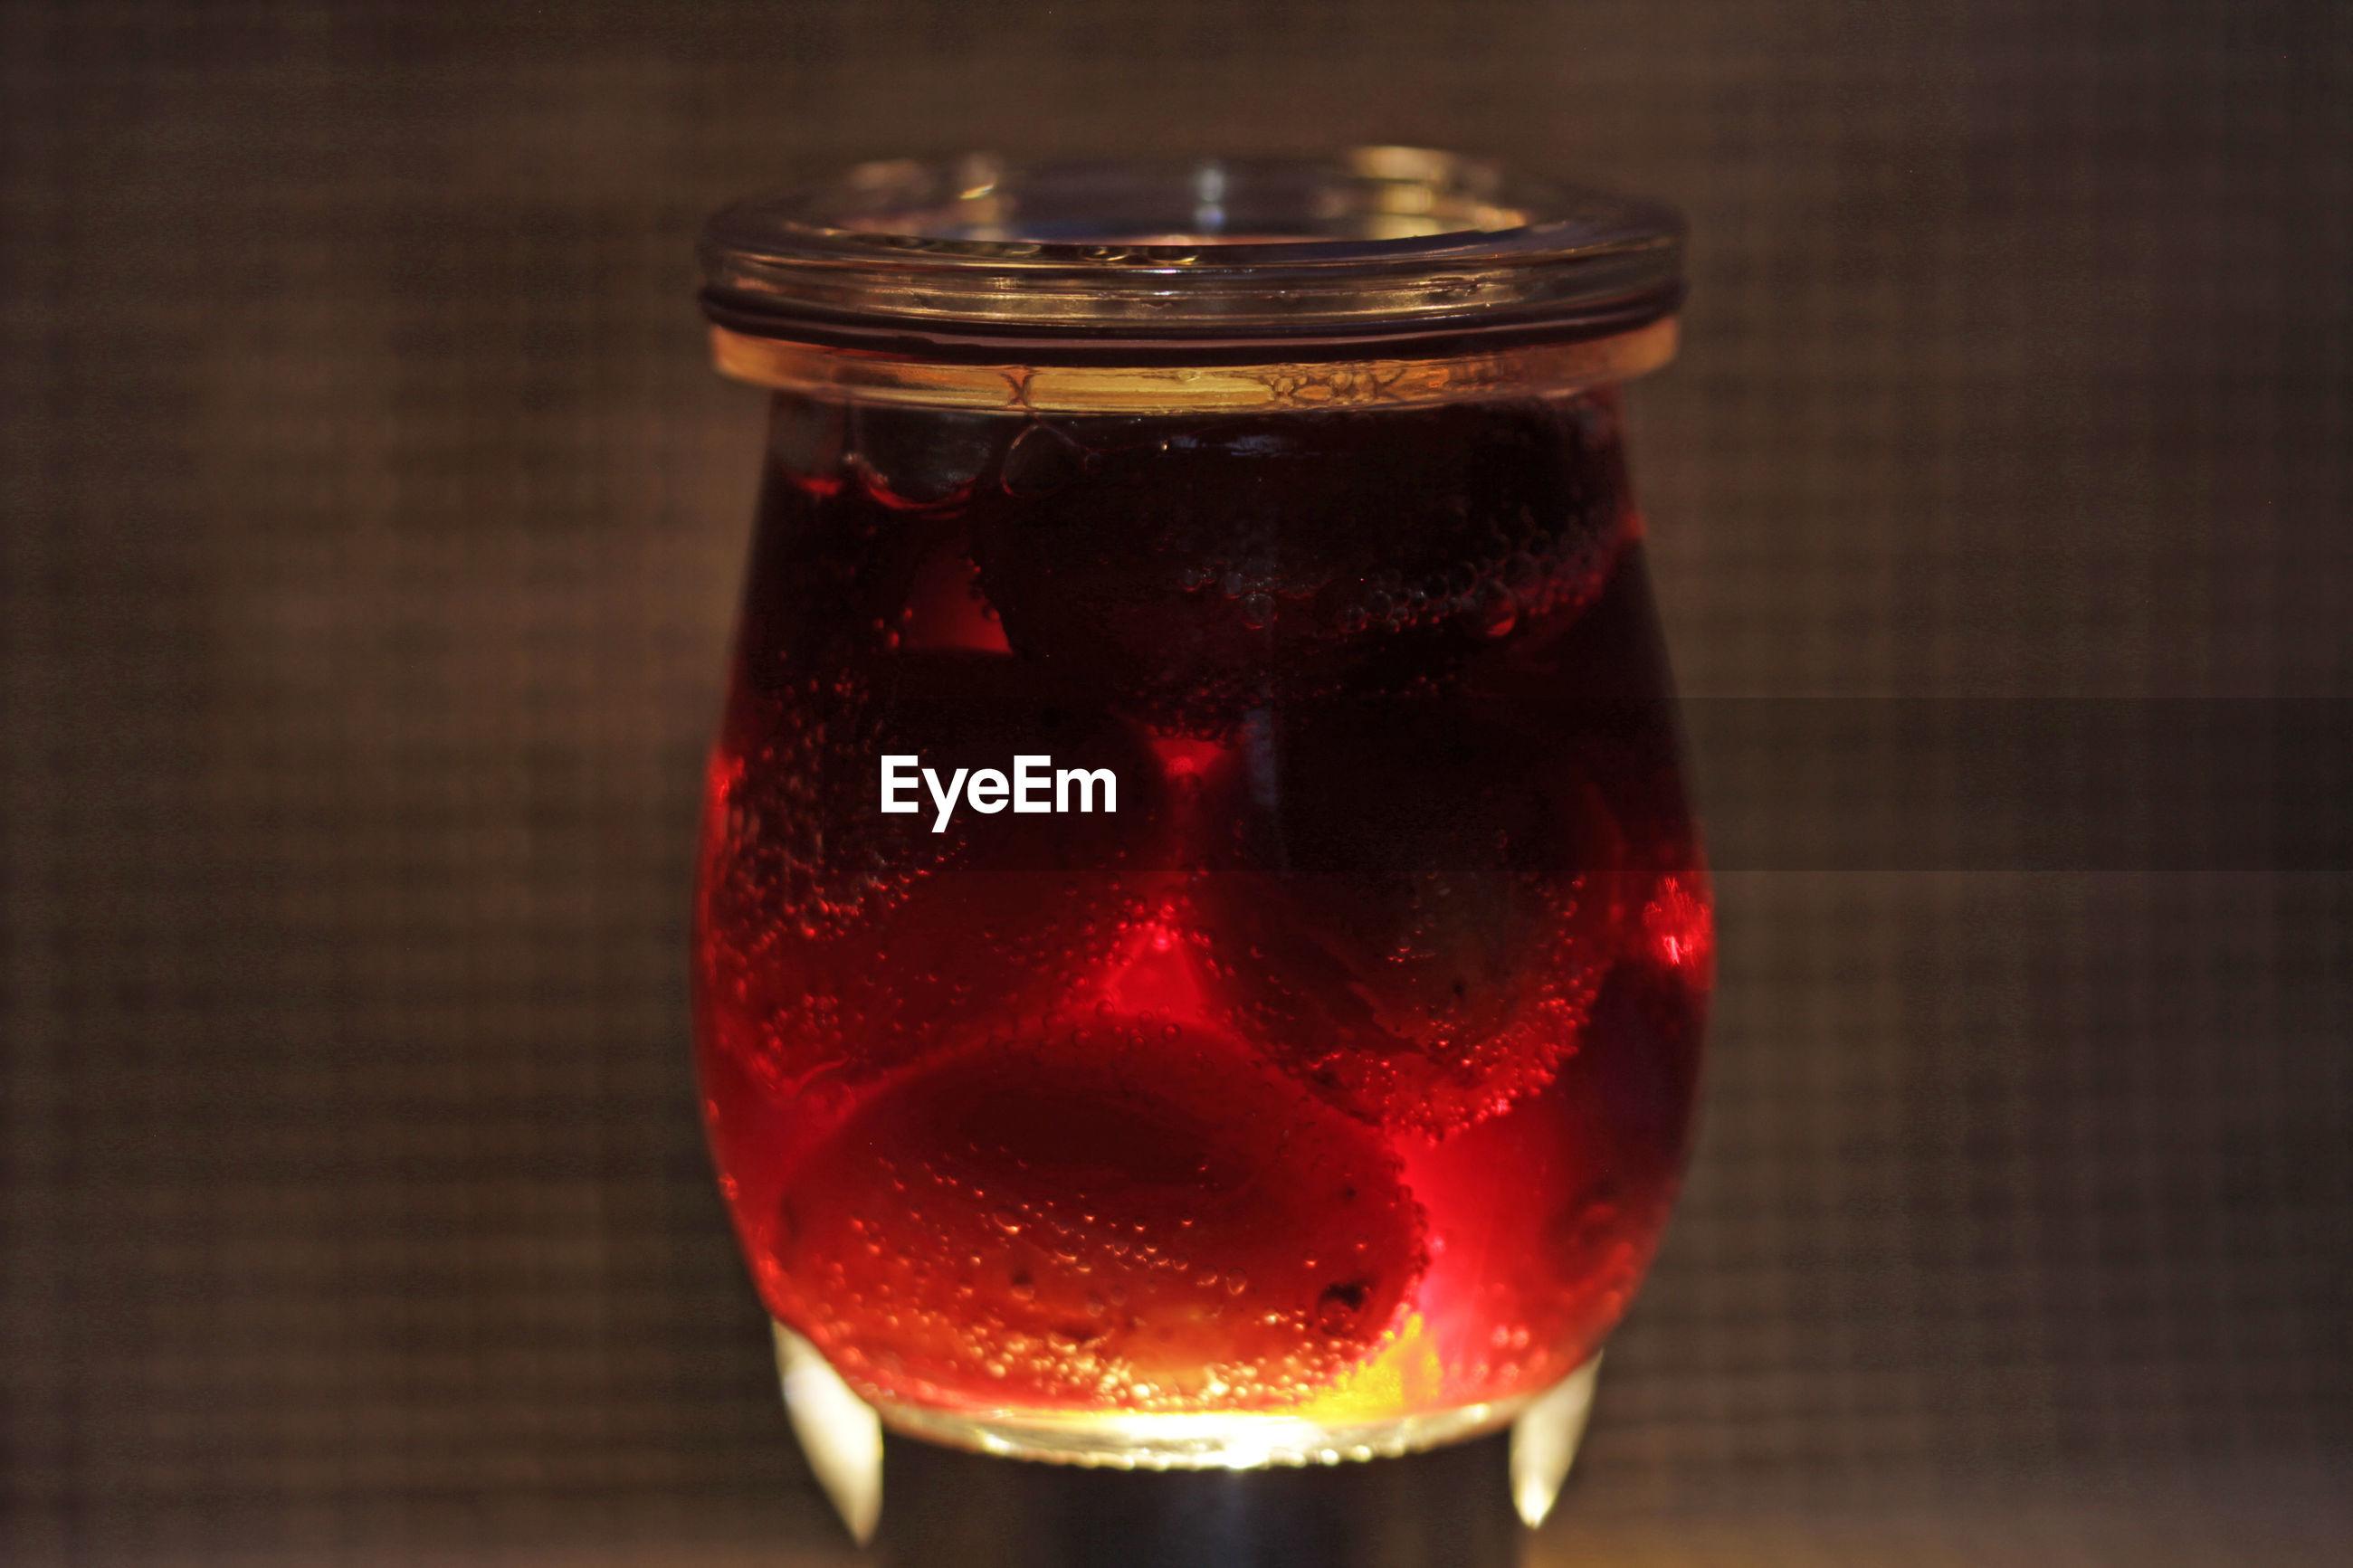 CLOSE-UP OF DRINK IN JAR